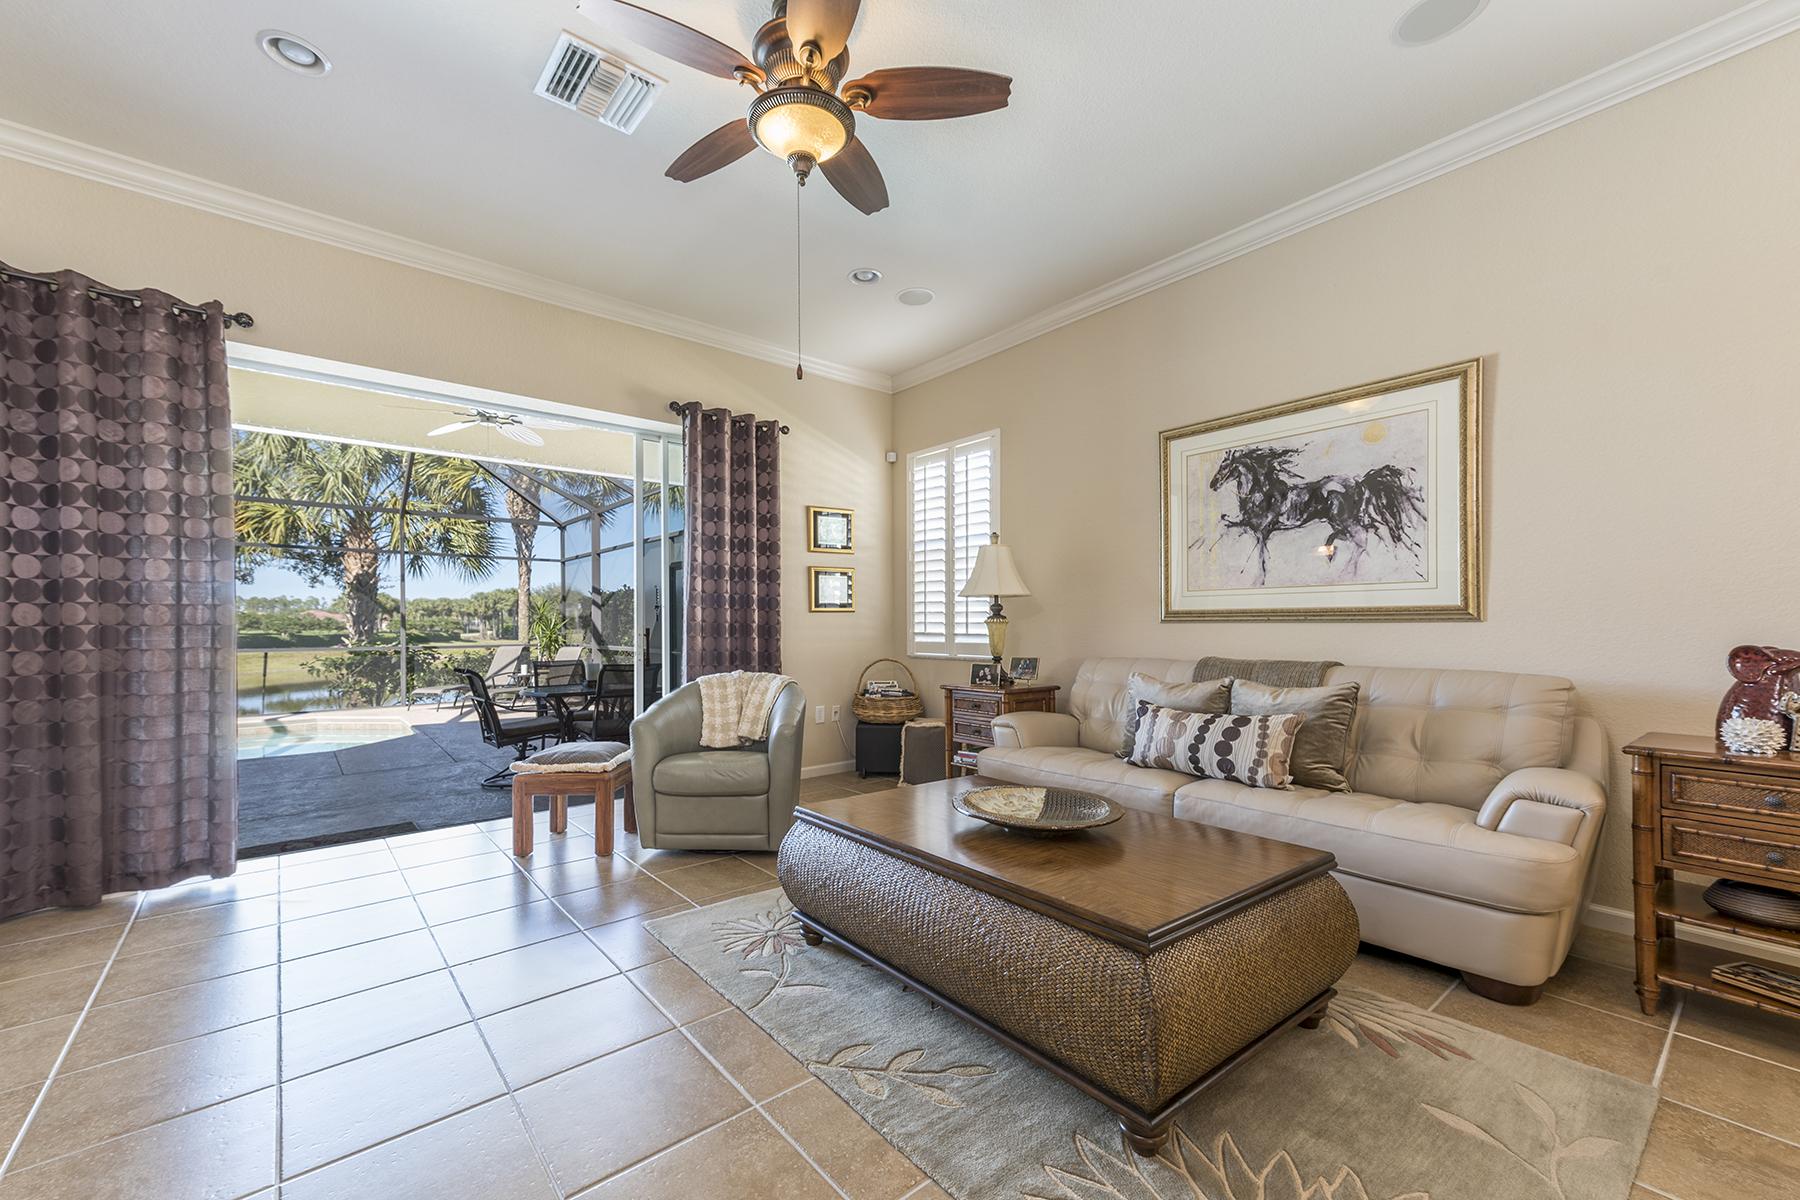 Single Family Home for Sale at HAWTHORNE - COBBLESTONE 10373 Flat Stone Loop, Bonita Springs, Florida 34135 United States